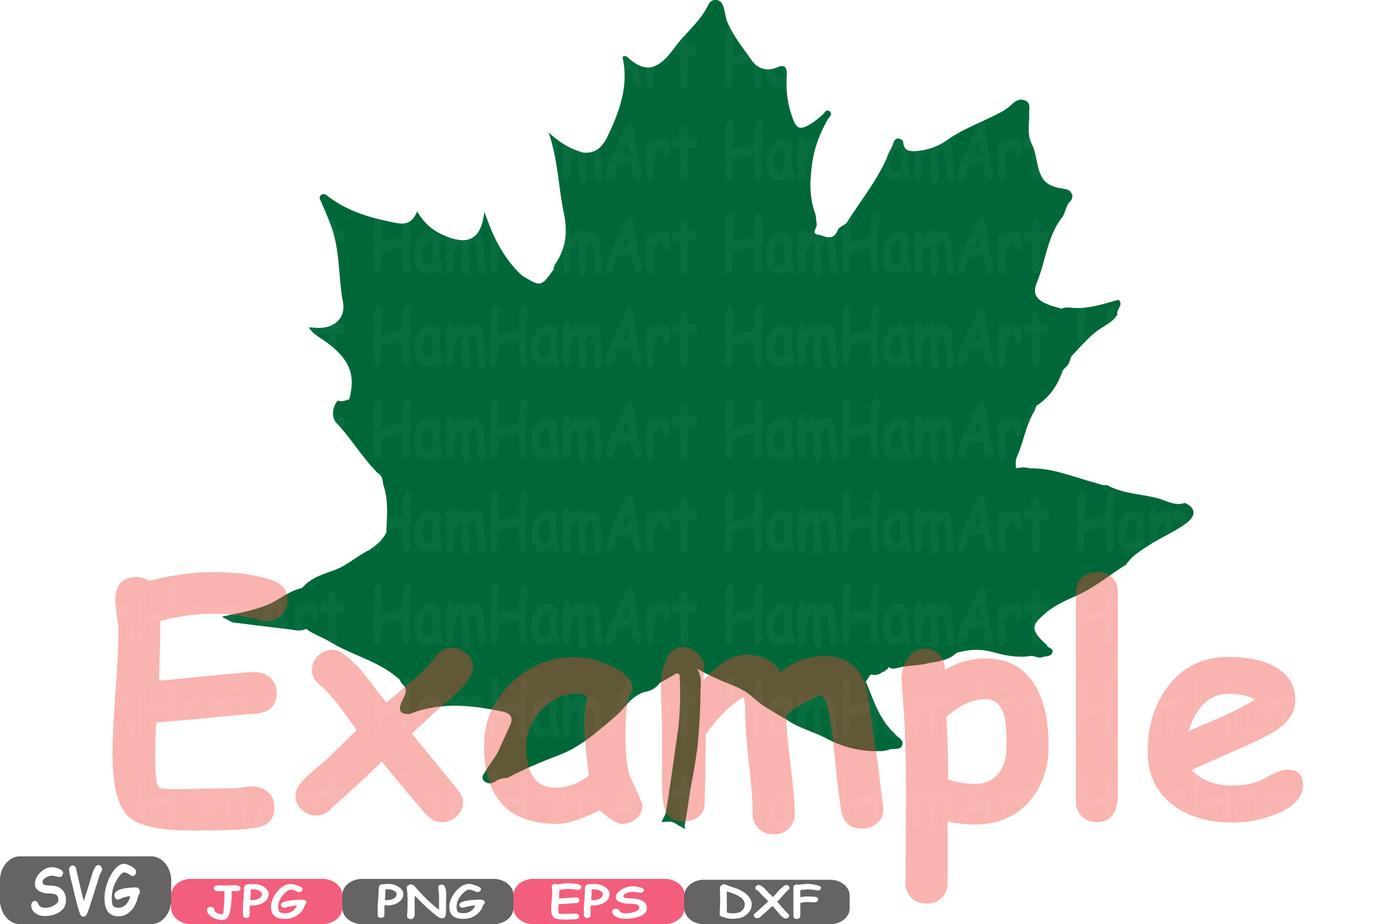 1400x924 Fall Leaf Designs Silhouette Svg File Cutting Files Stickers